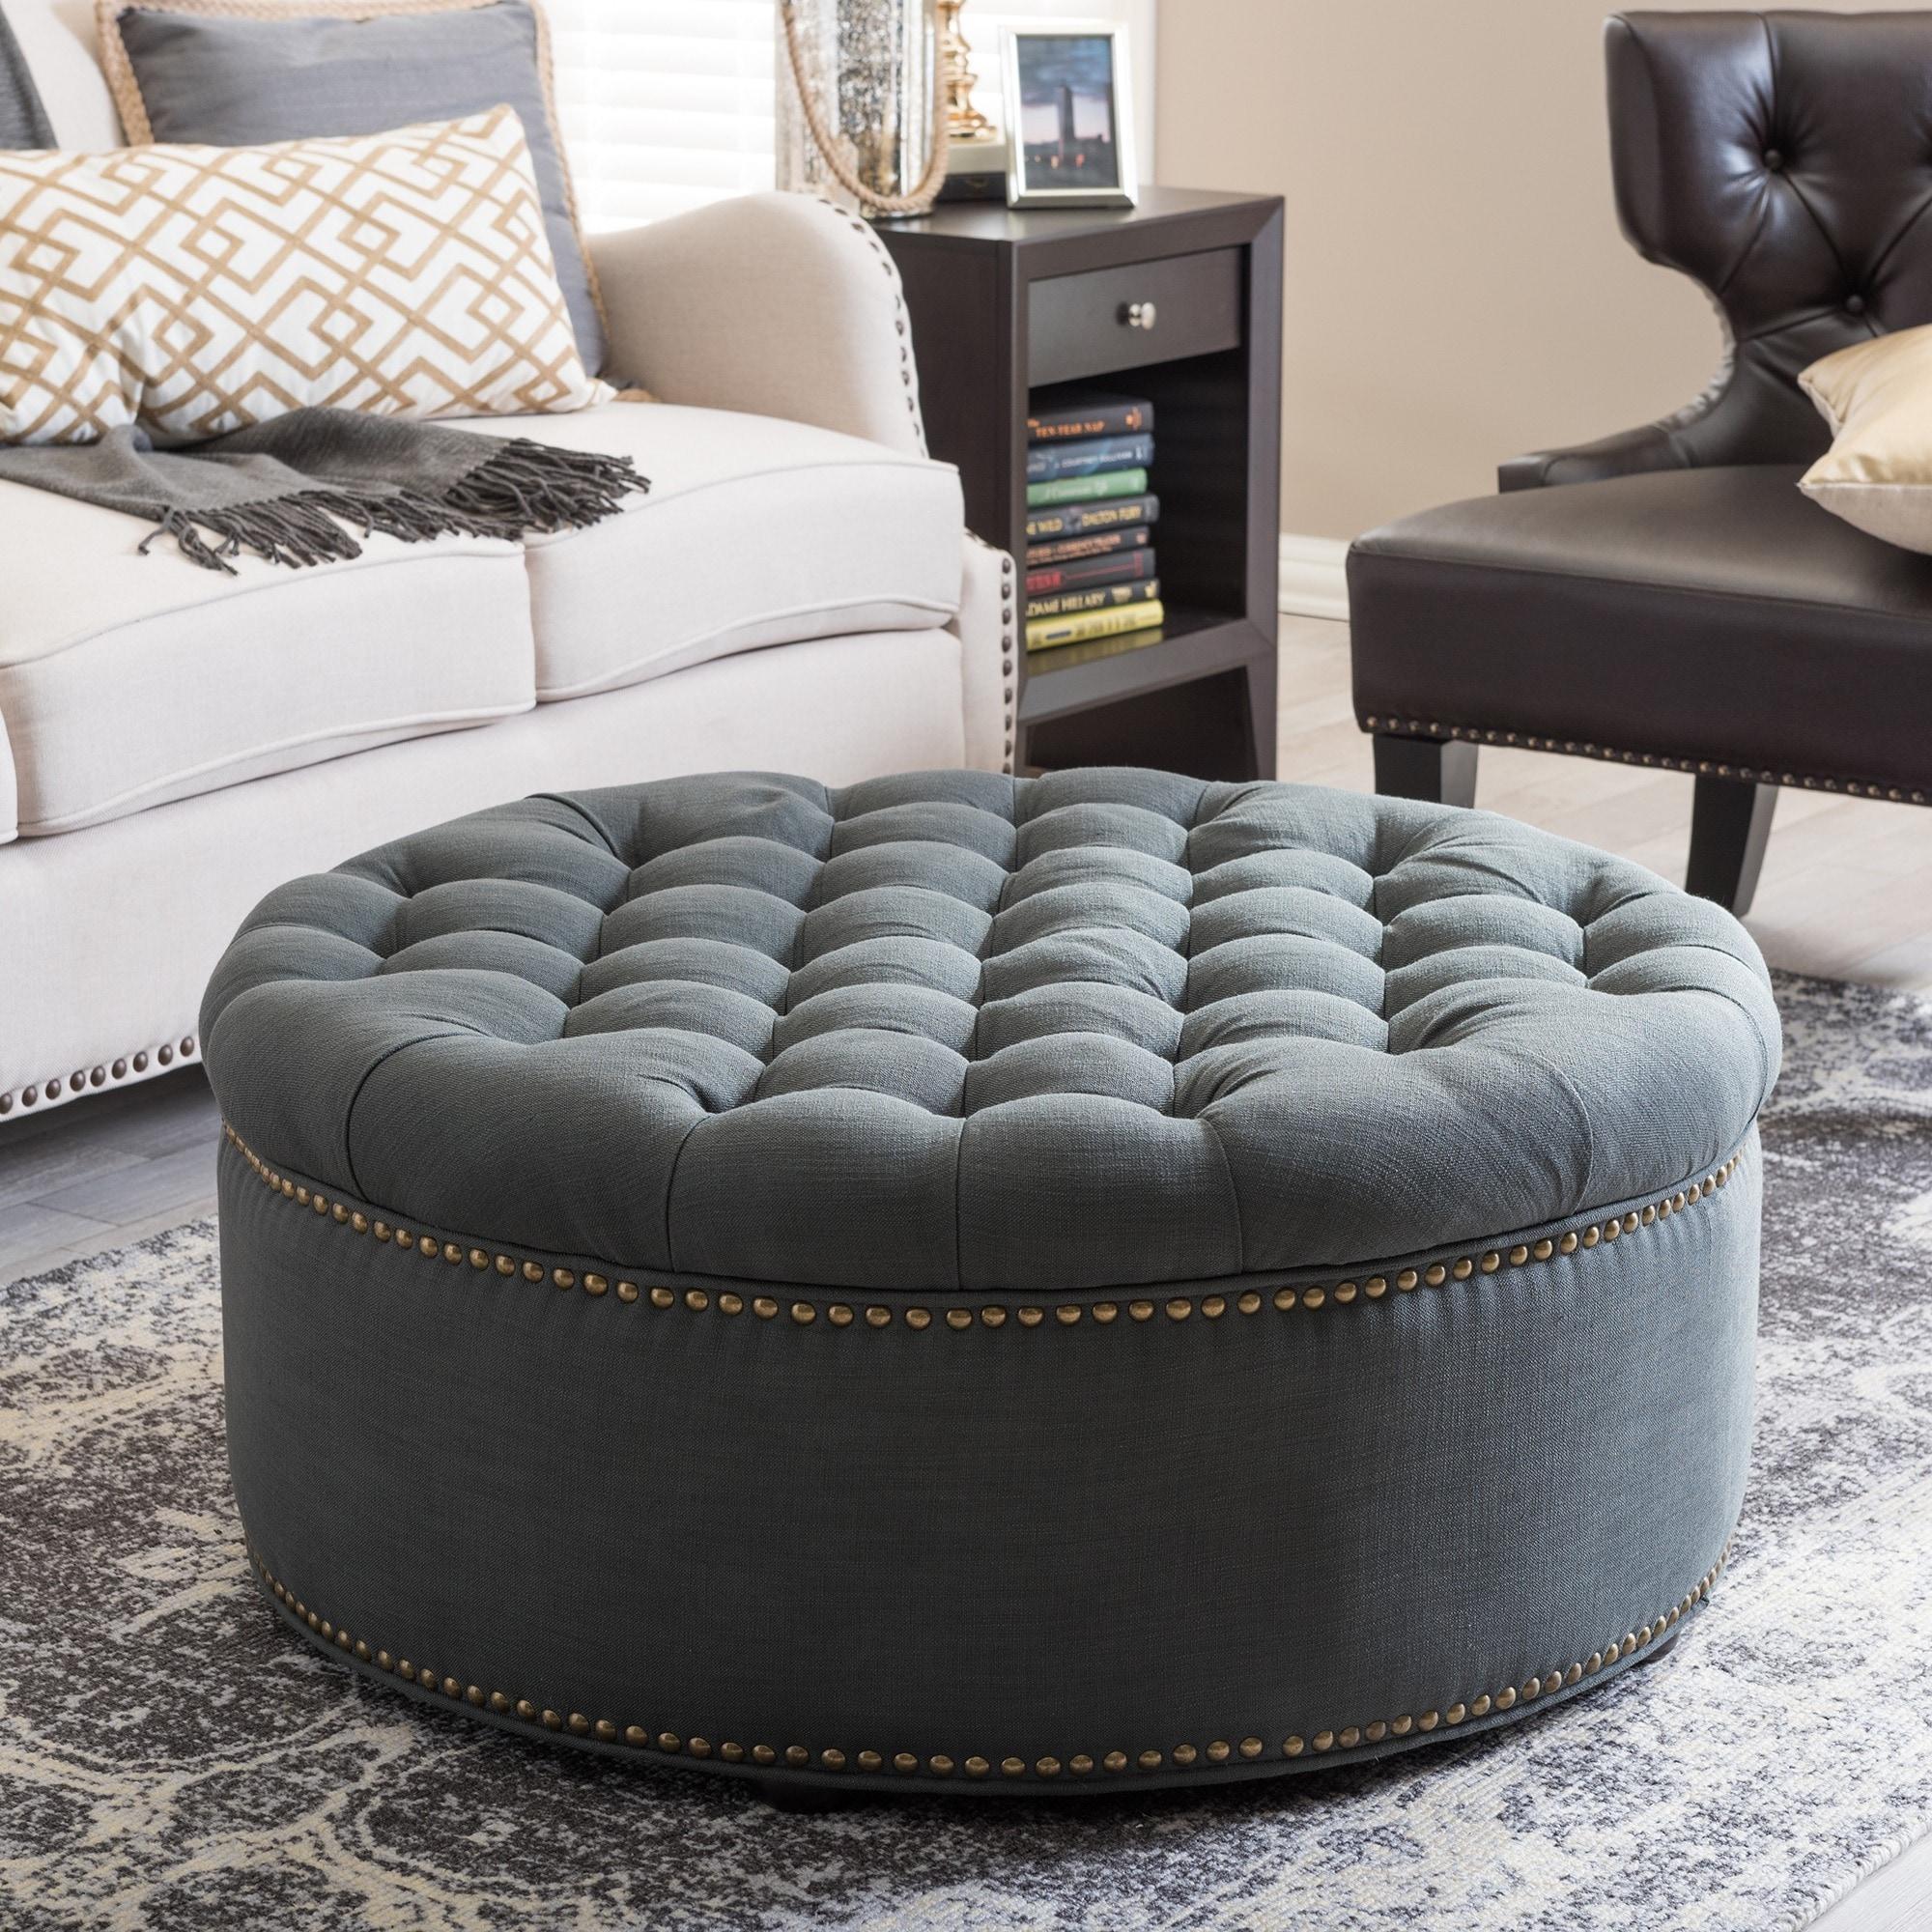 Shop baxton studio iglehart grey linen modern tufted ottoman free shipping today overstock com 8463100